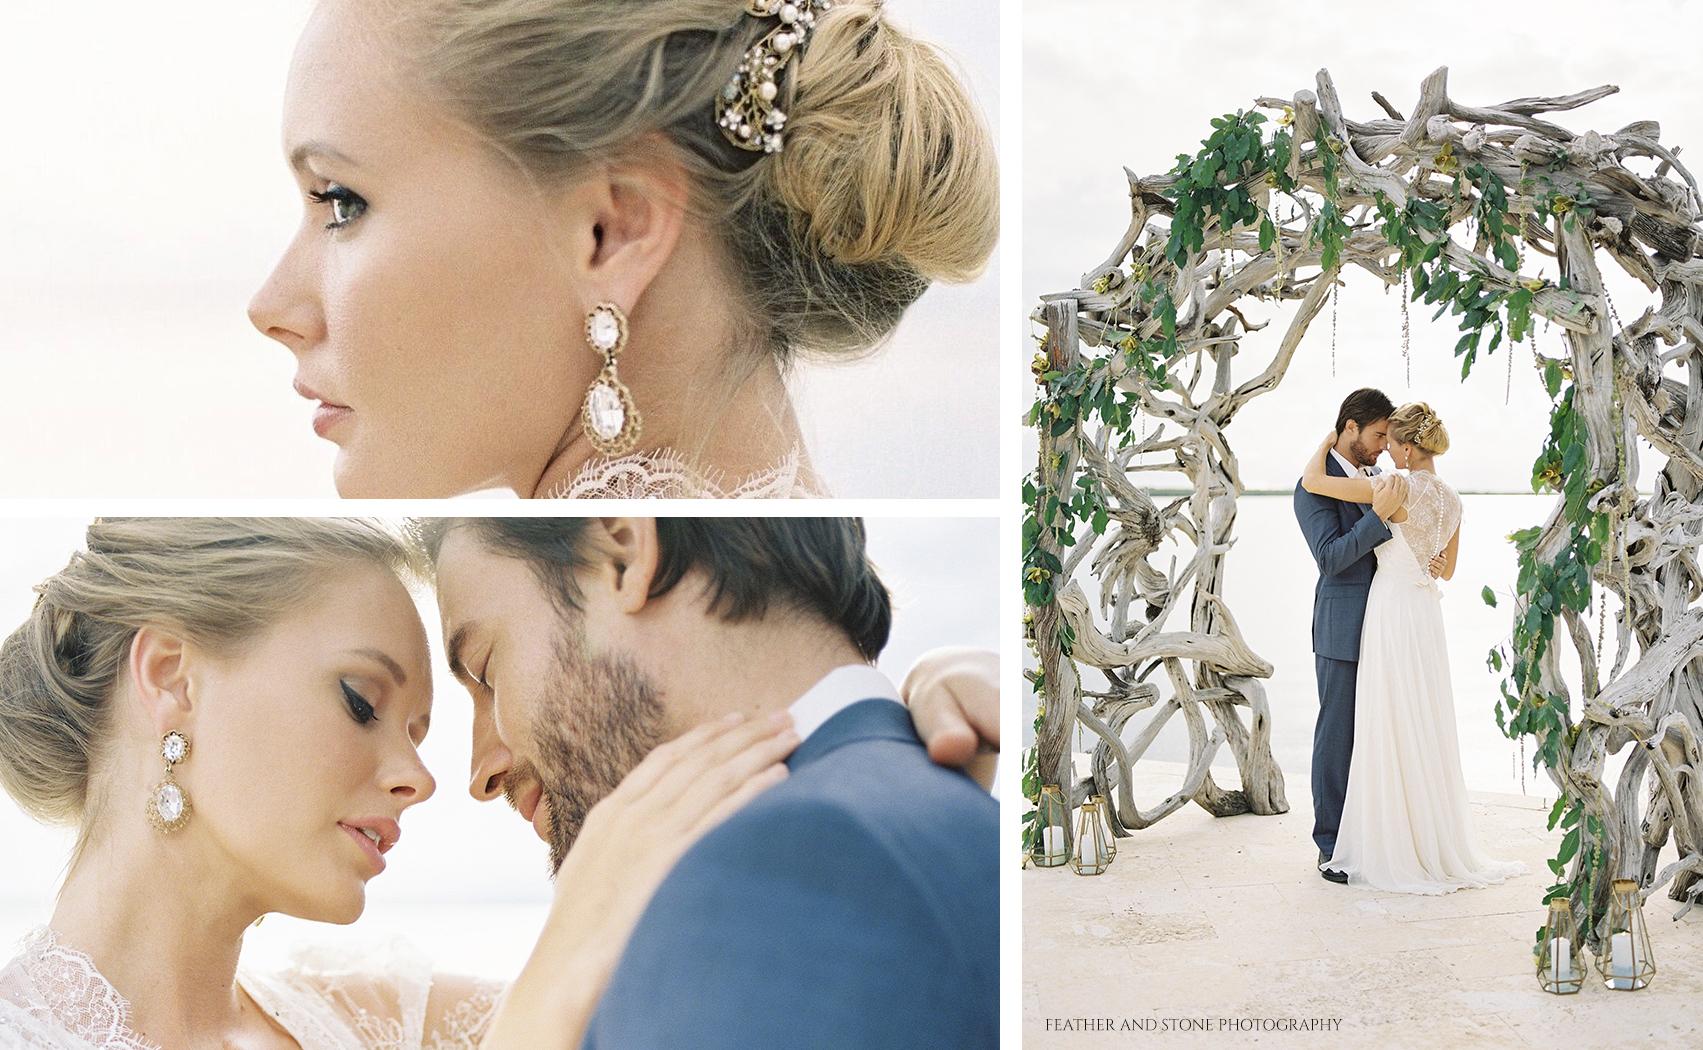 Carolyn Jones Collage 1.jpg